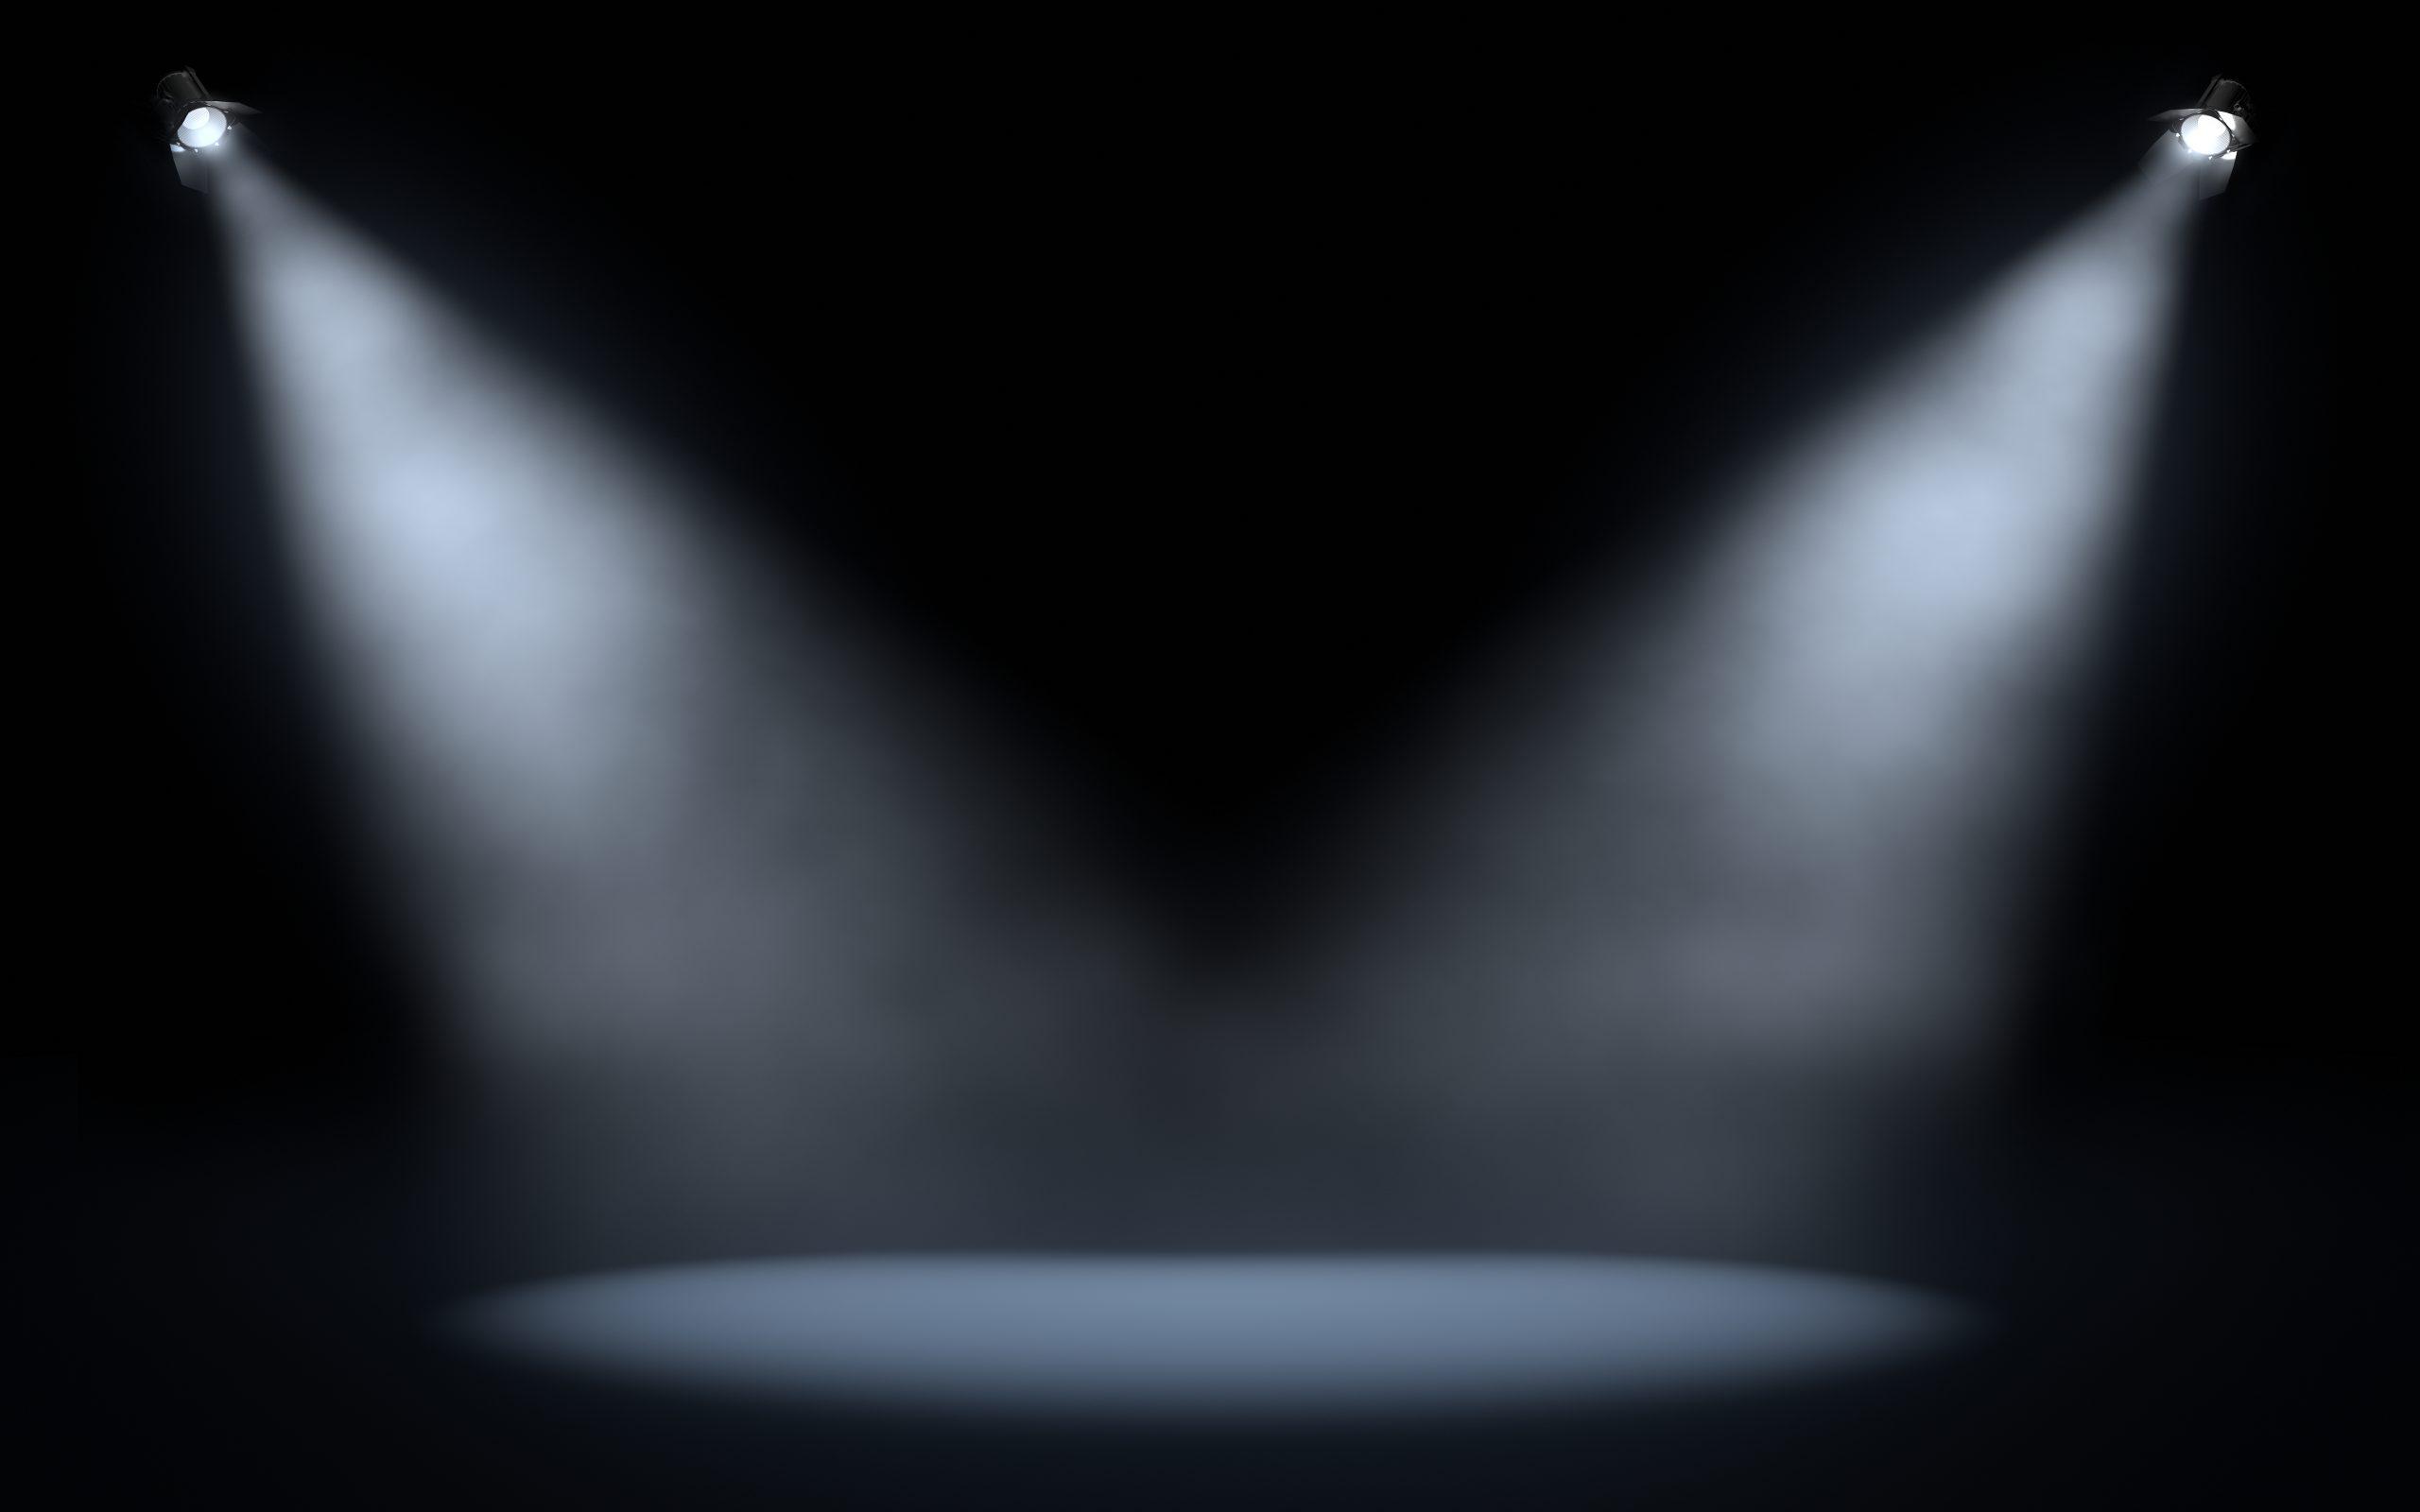 https://depositphotos.com/26568791/stock-photo-stage-spotlights.html